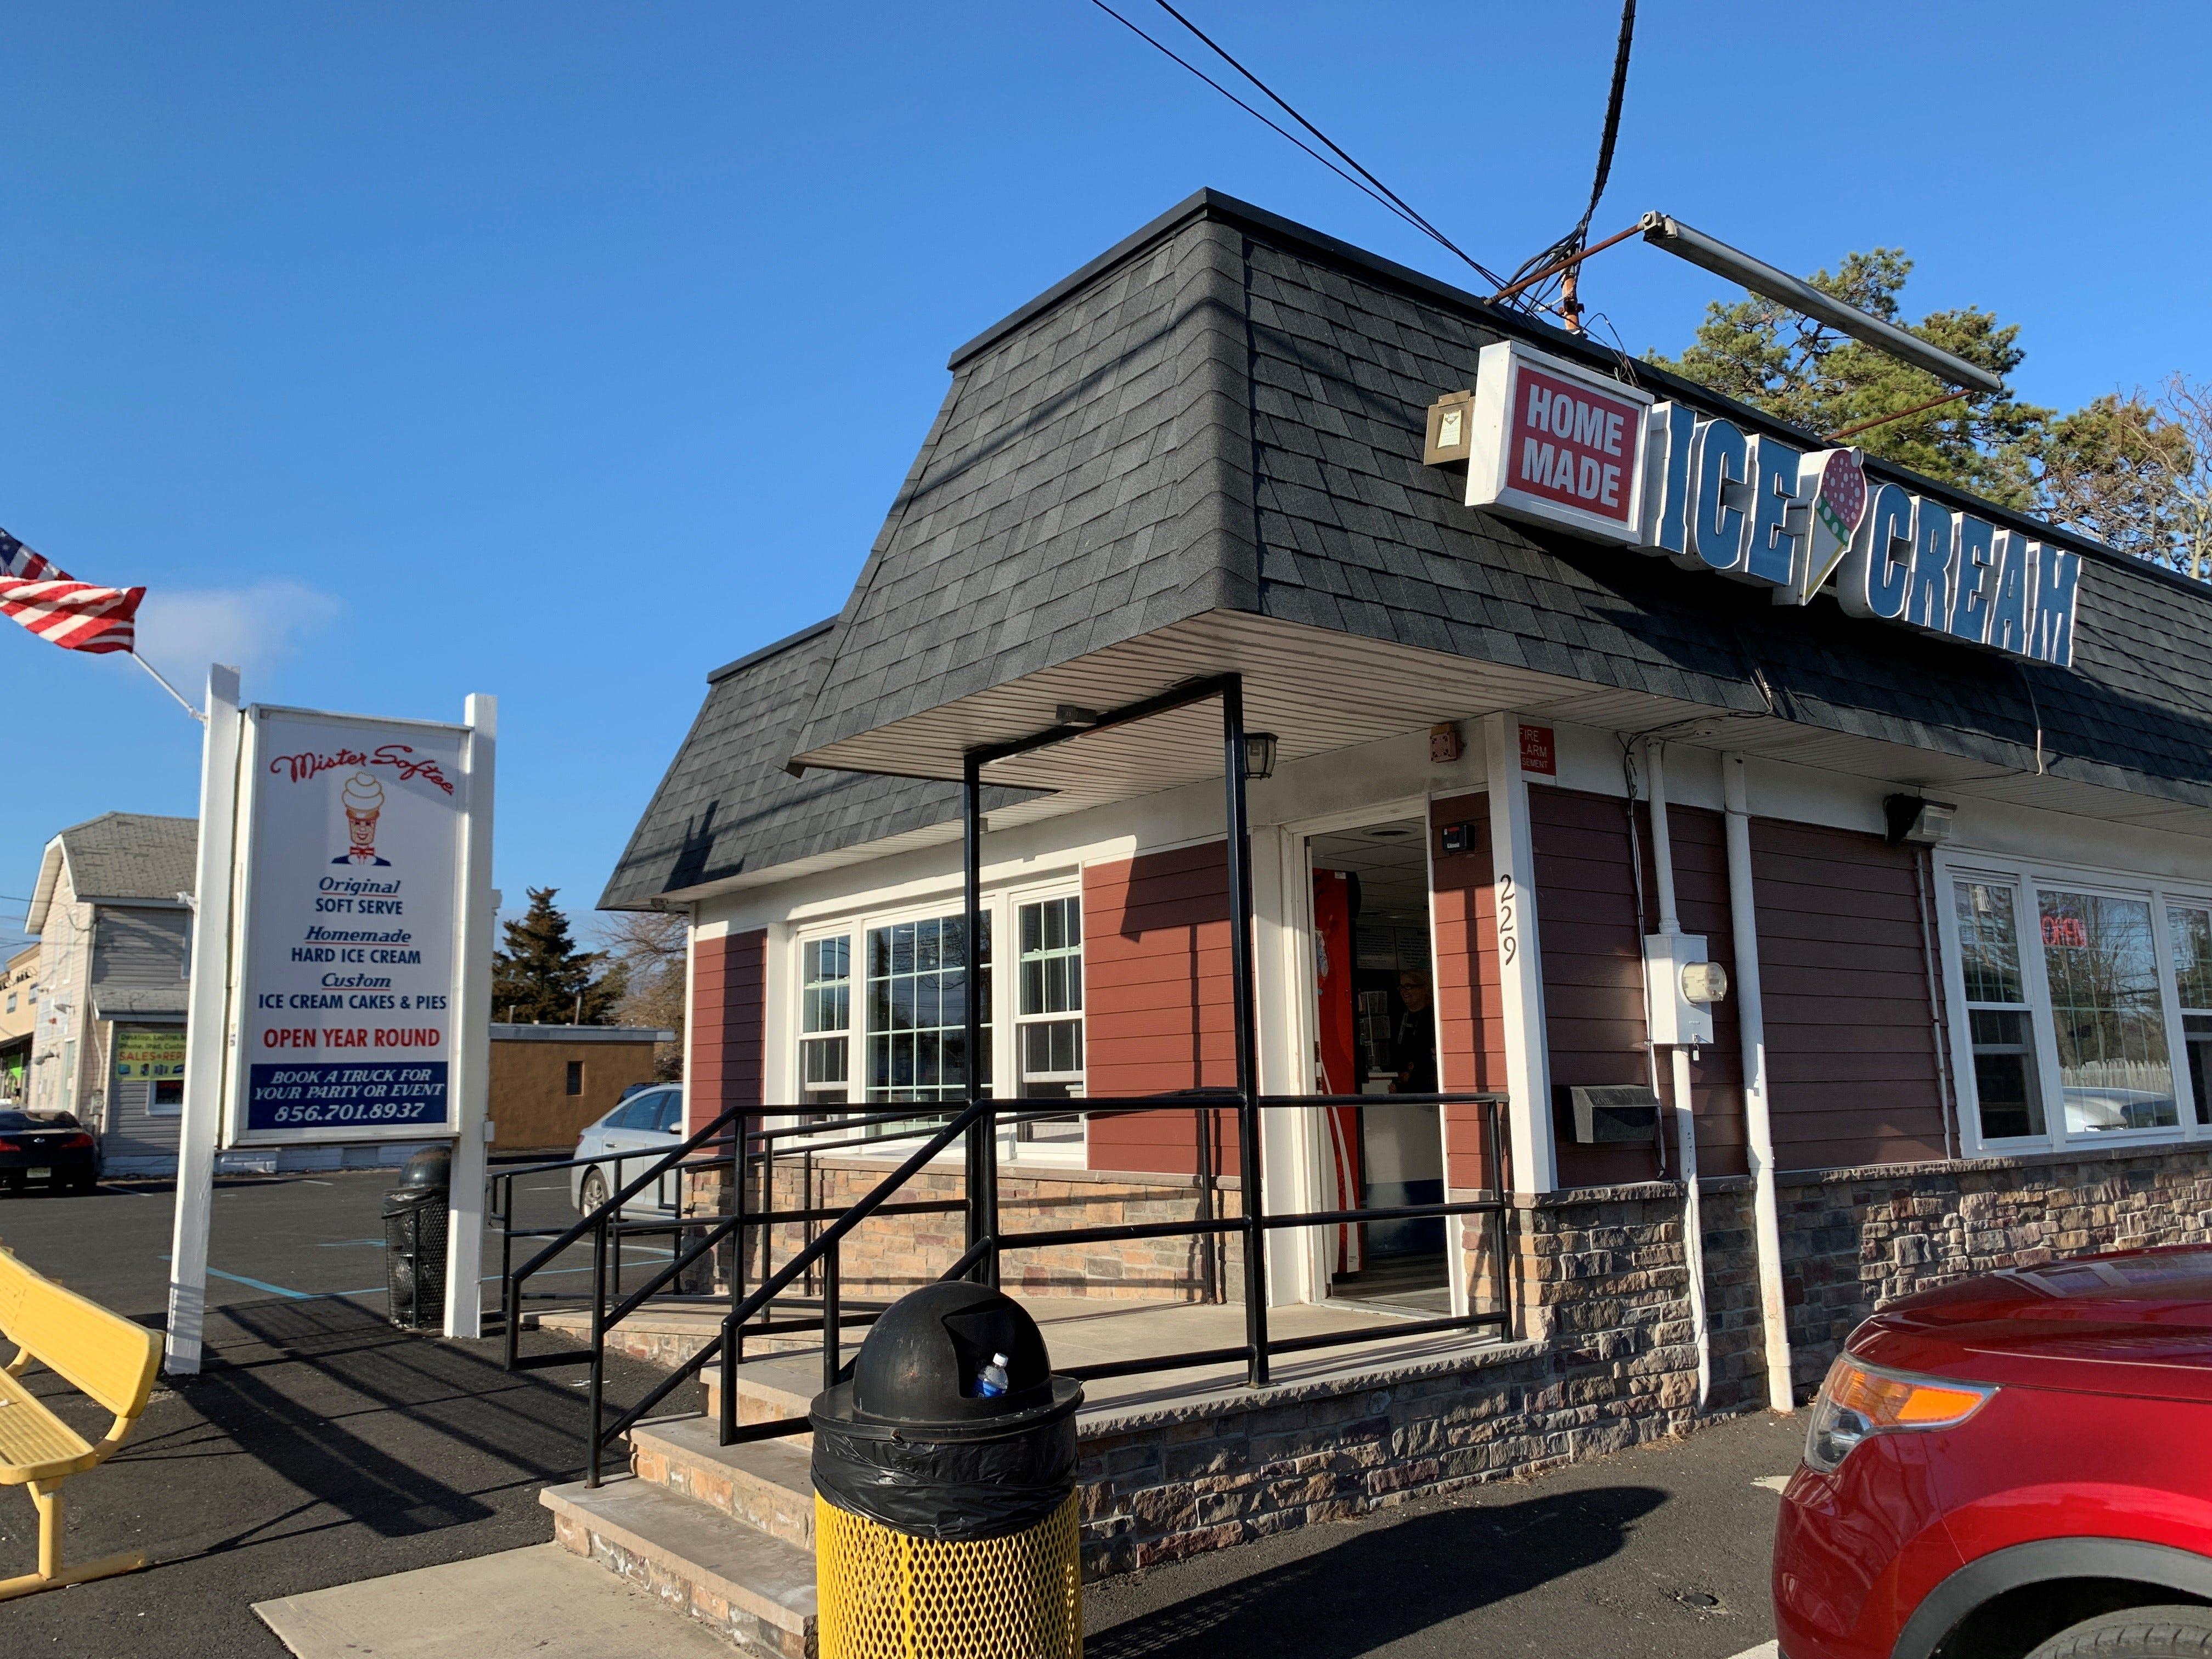 Nj Restaurants 15 New Restaurants At The Jersey Shore